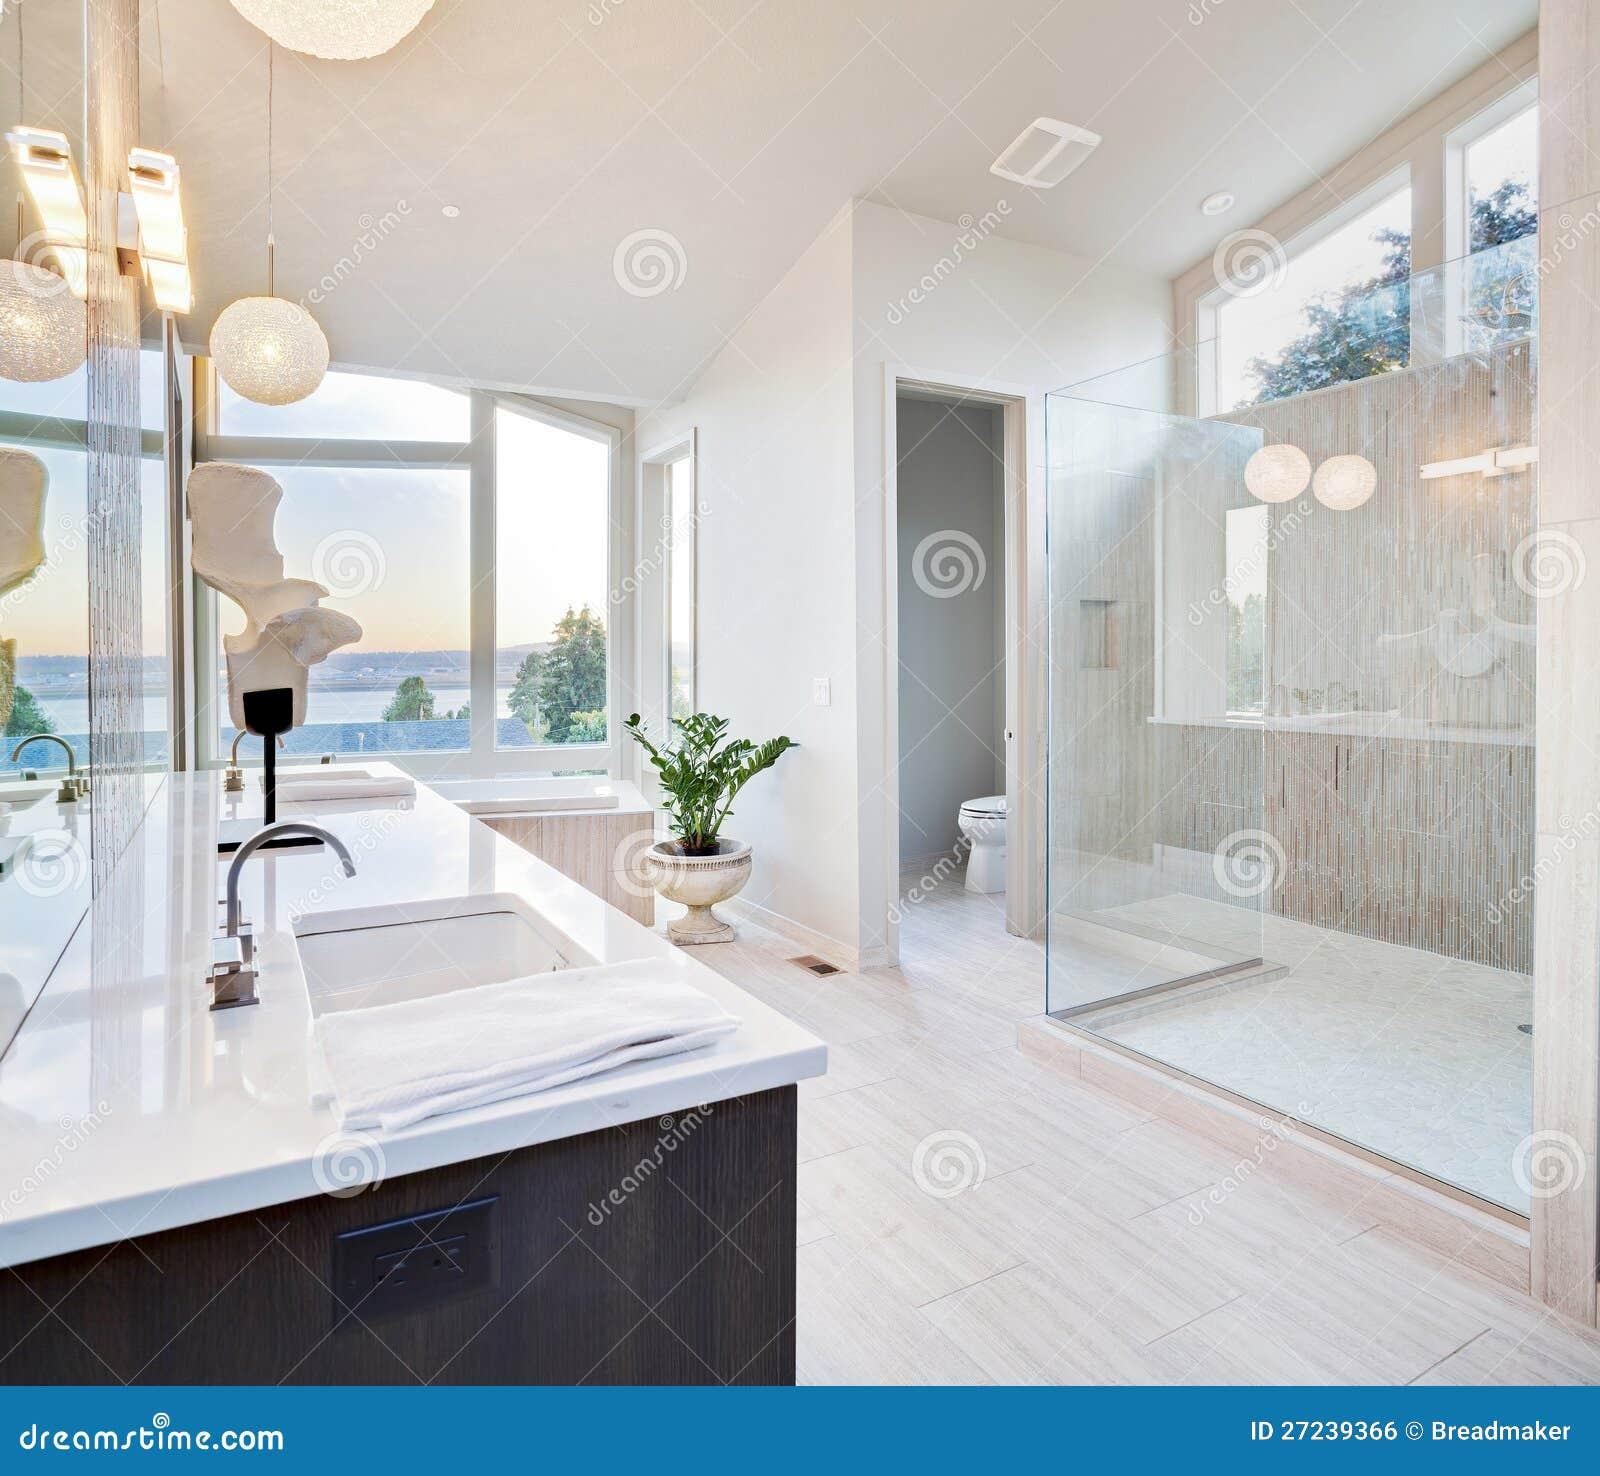 luxury bathroom royalty free stock image - image: 27239366